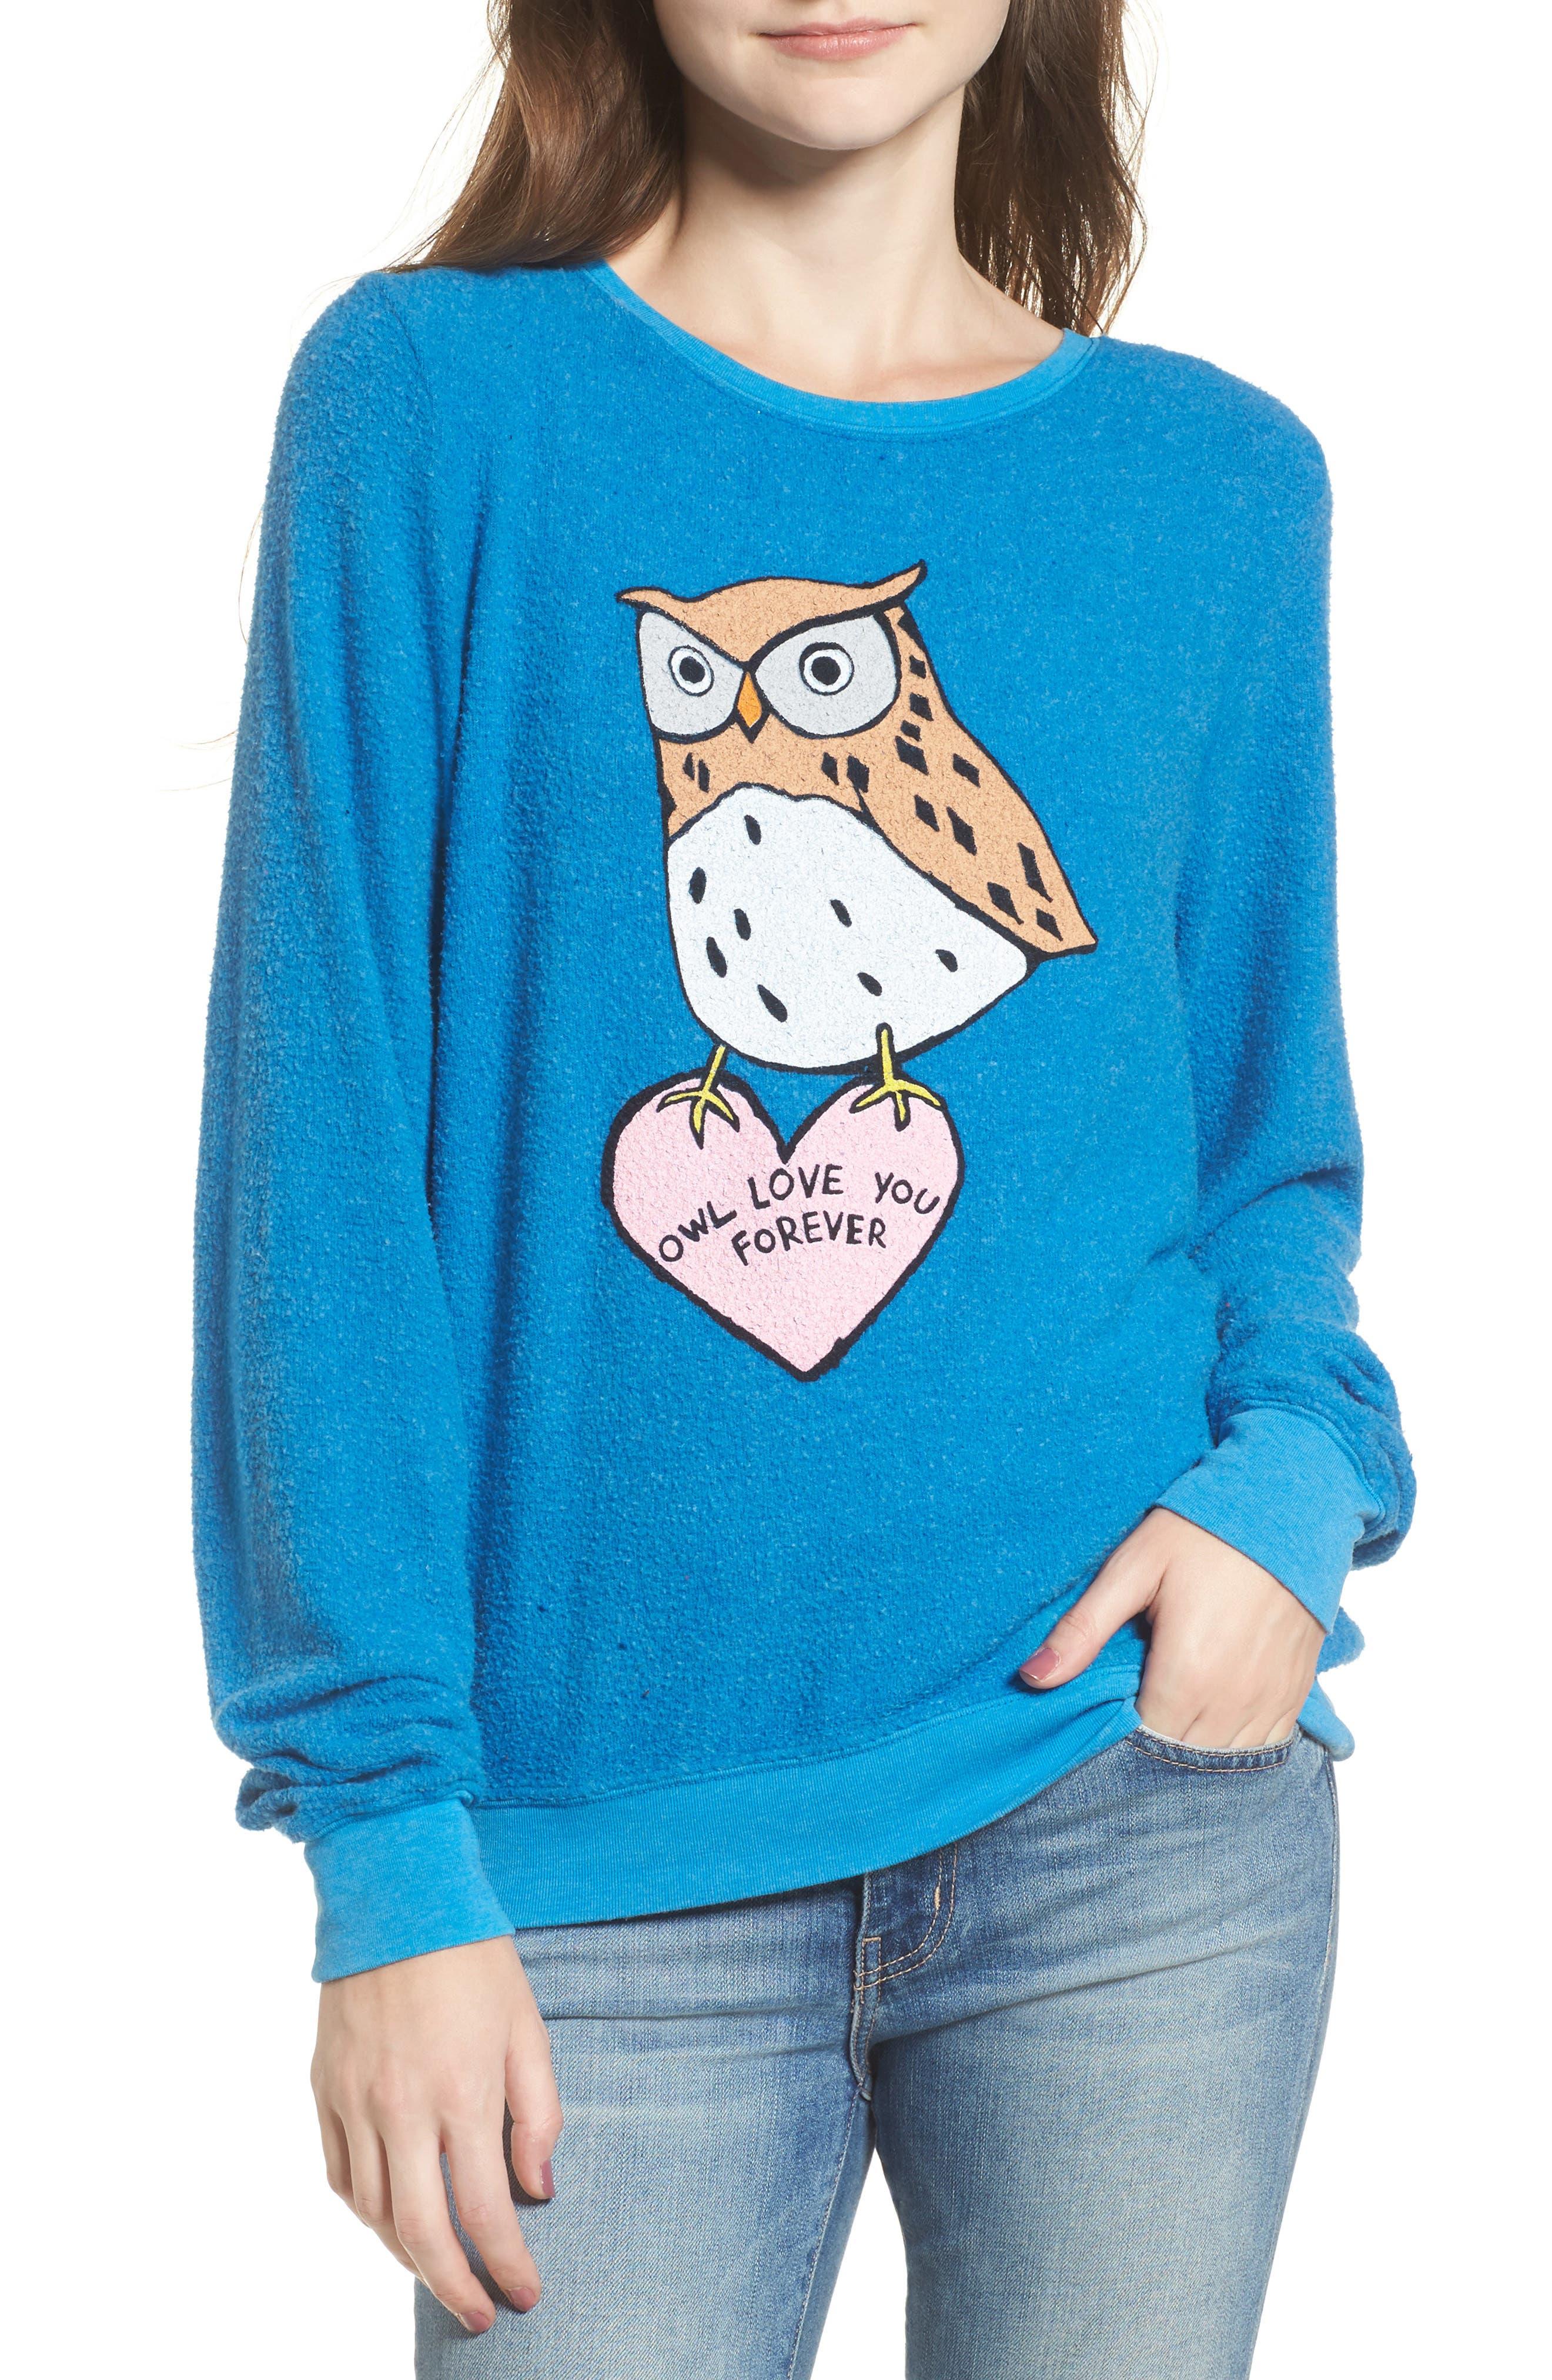 Owl Love You Forever Sweatshirt,                             Main thumbnail 1, color,                             Cobalt Sea